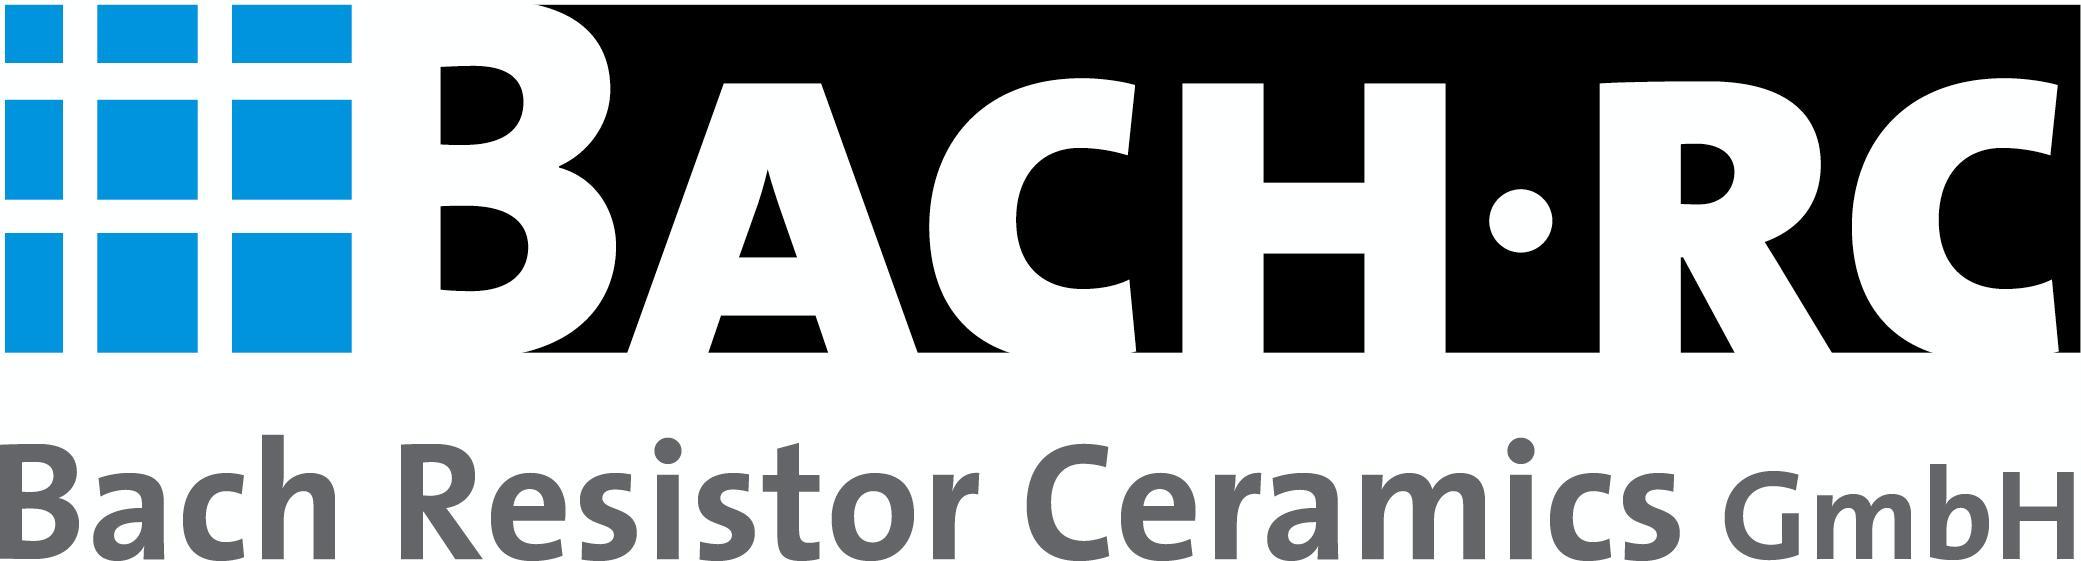 Bach Resistor Ceramics GmbH